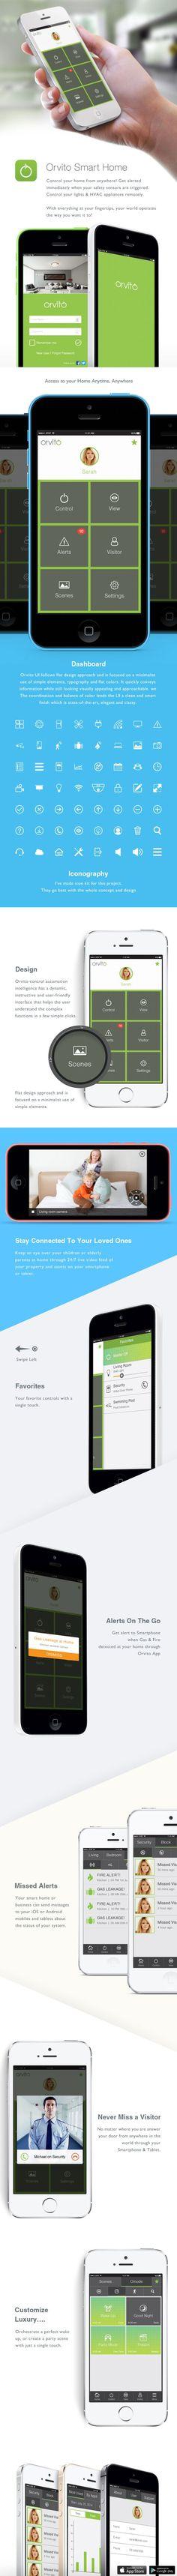 Orvito Smart Home Automation UI